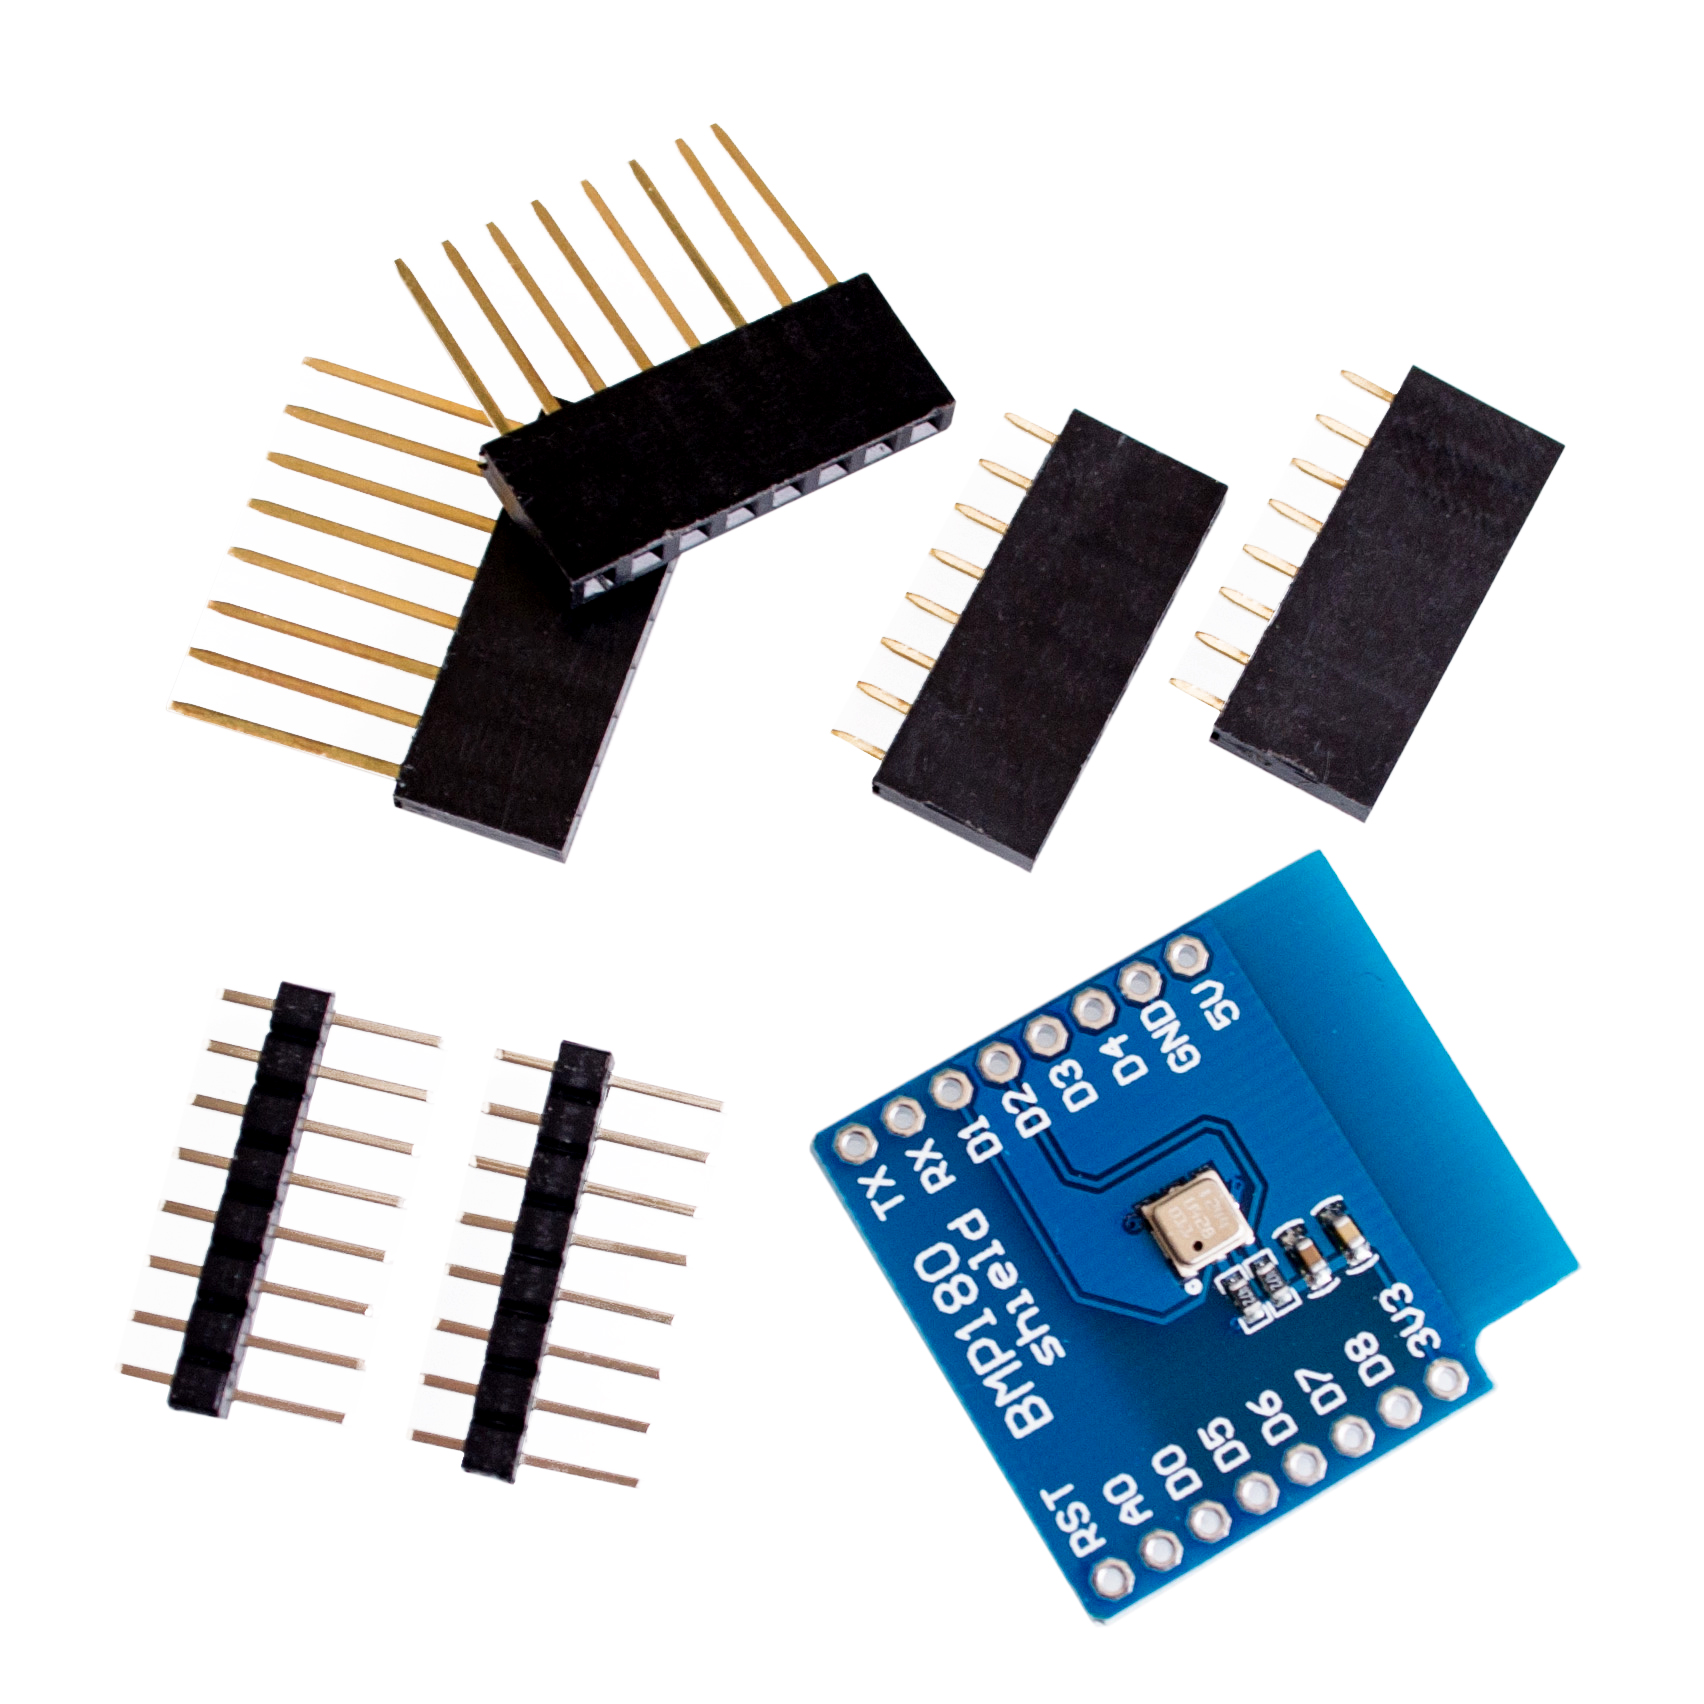 BMP180 Replace BMP085 Digital Barometric Pressure Sensor Module FOR D1 mini WIFI extension board learning board